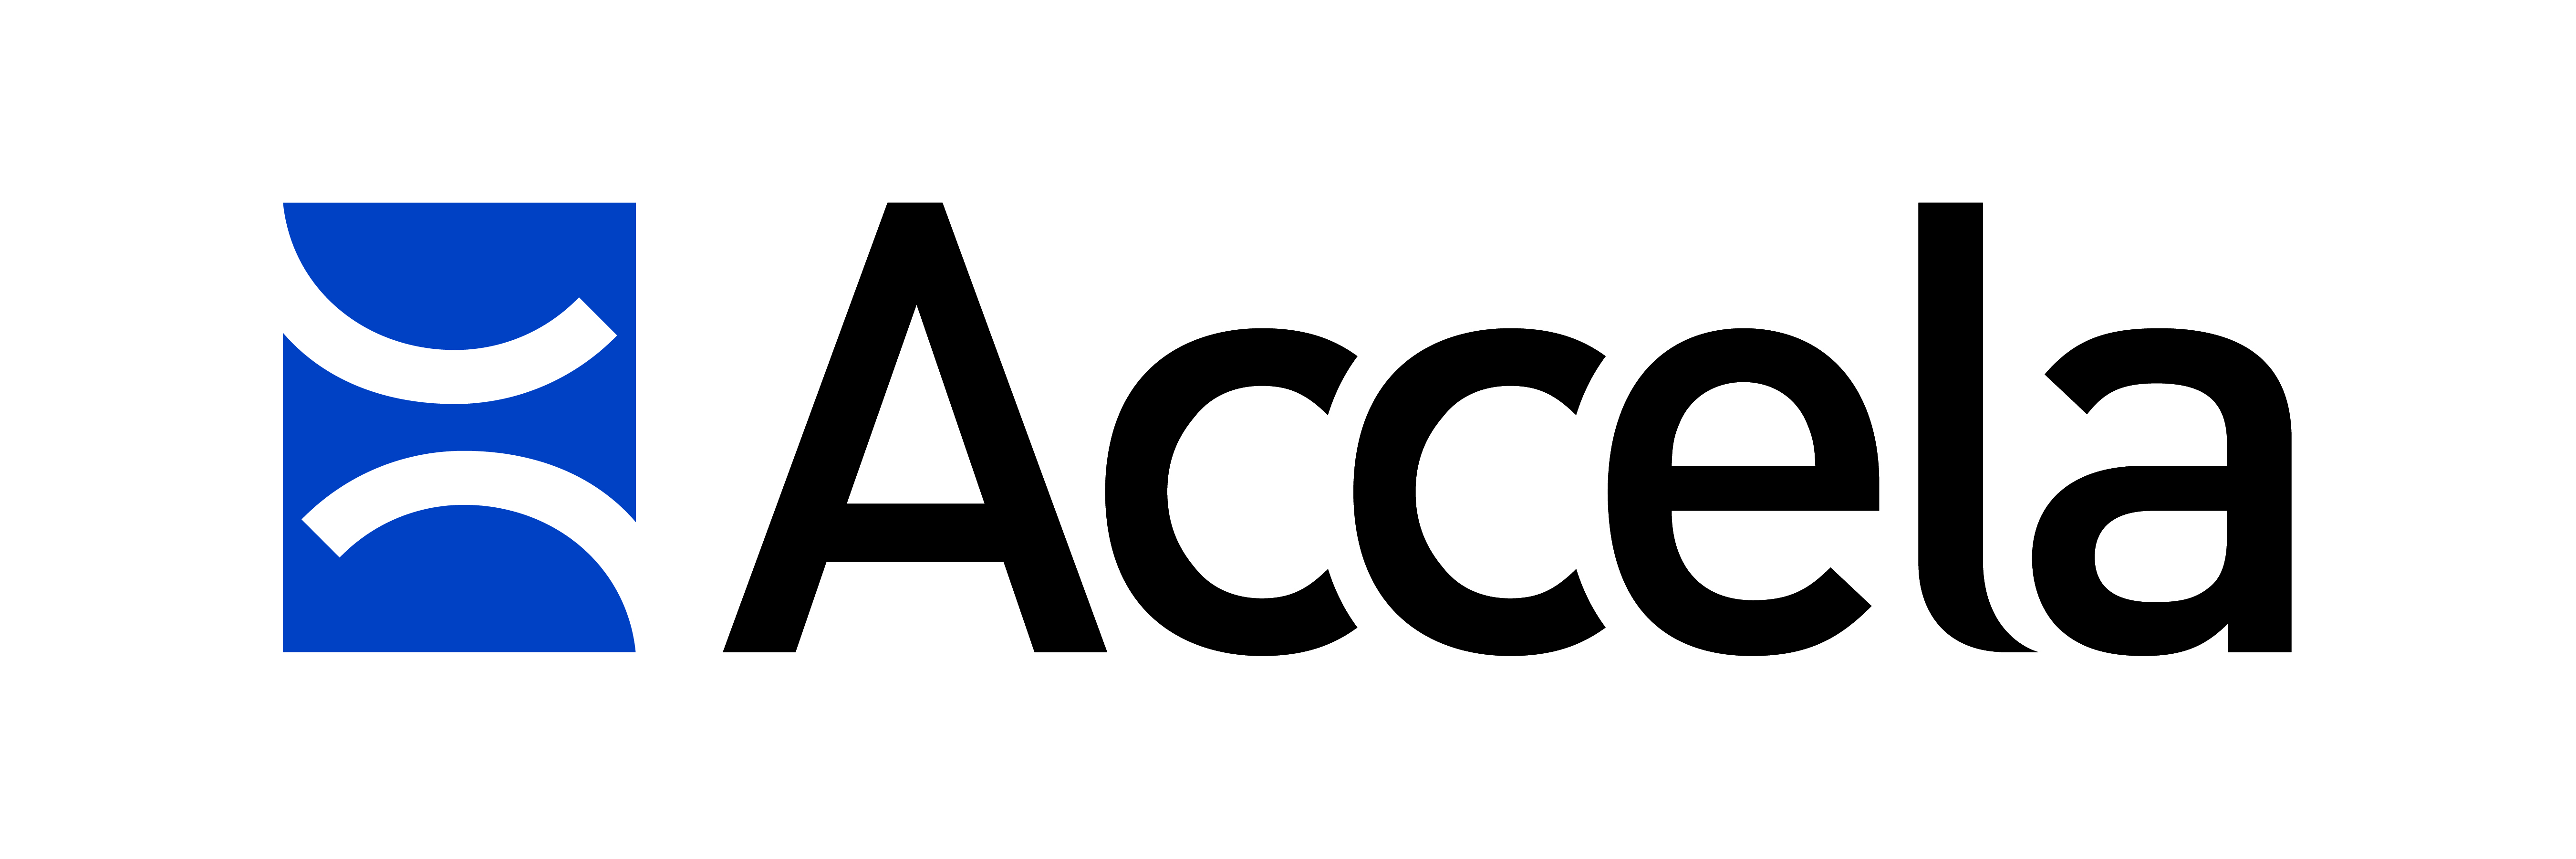 Accela_Logo